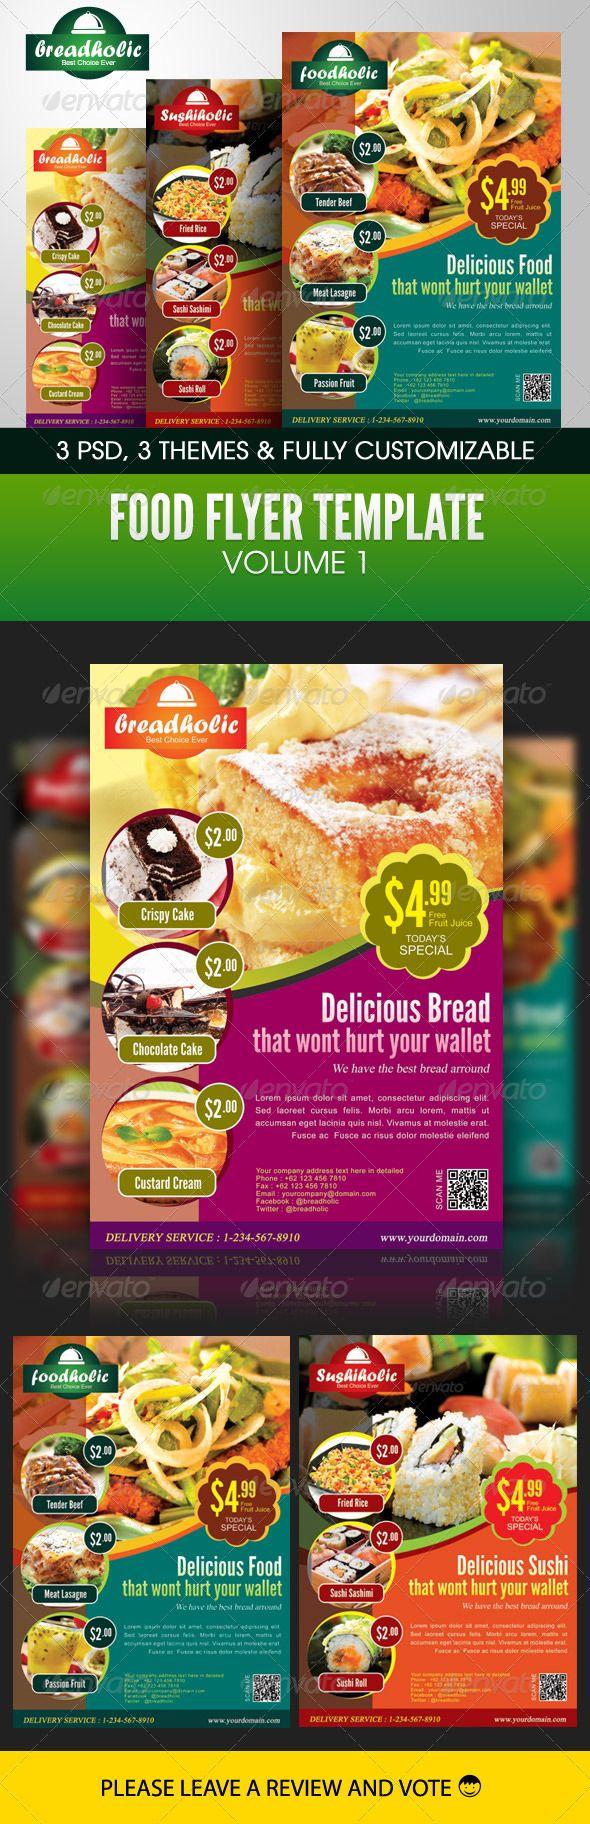 Food Flyer Template Volume 1